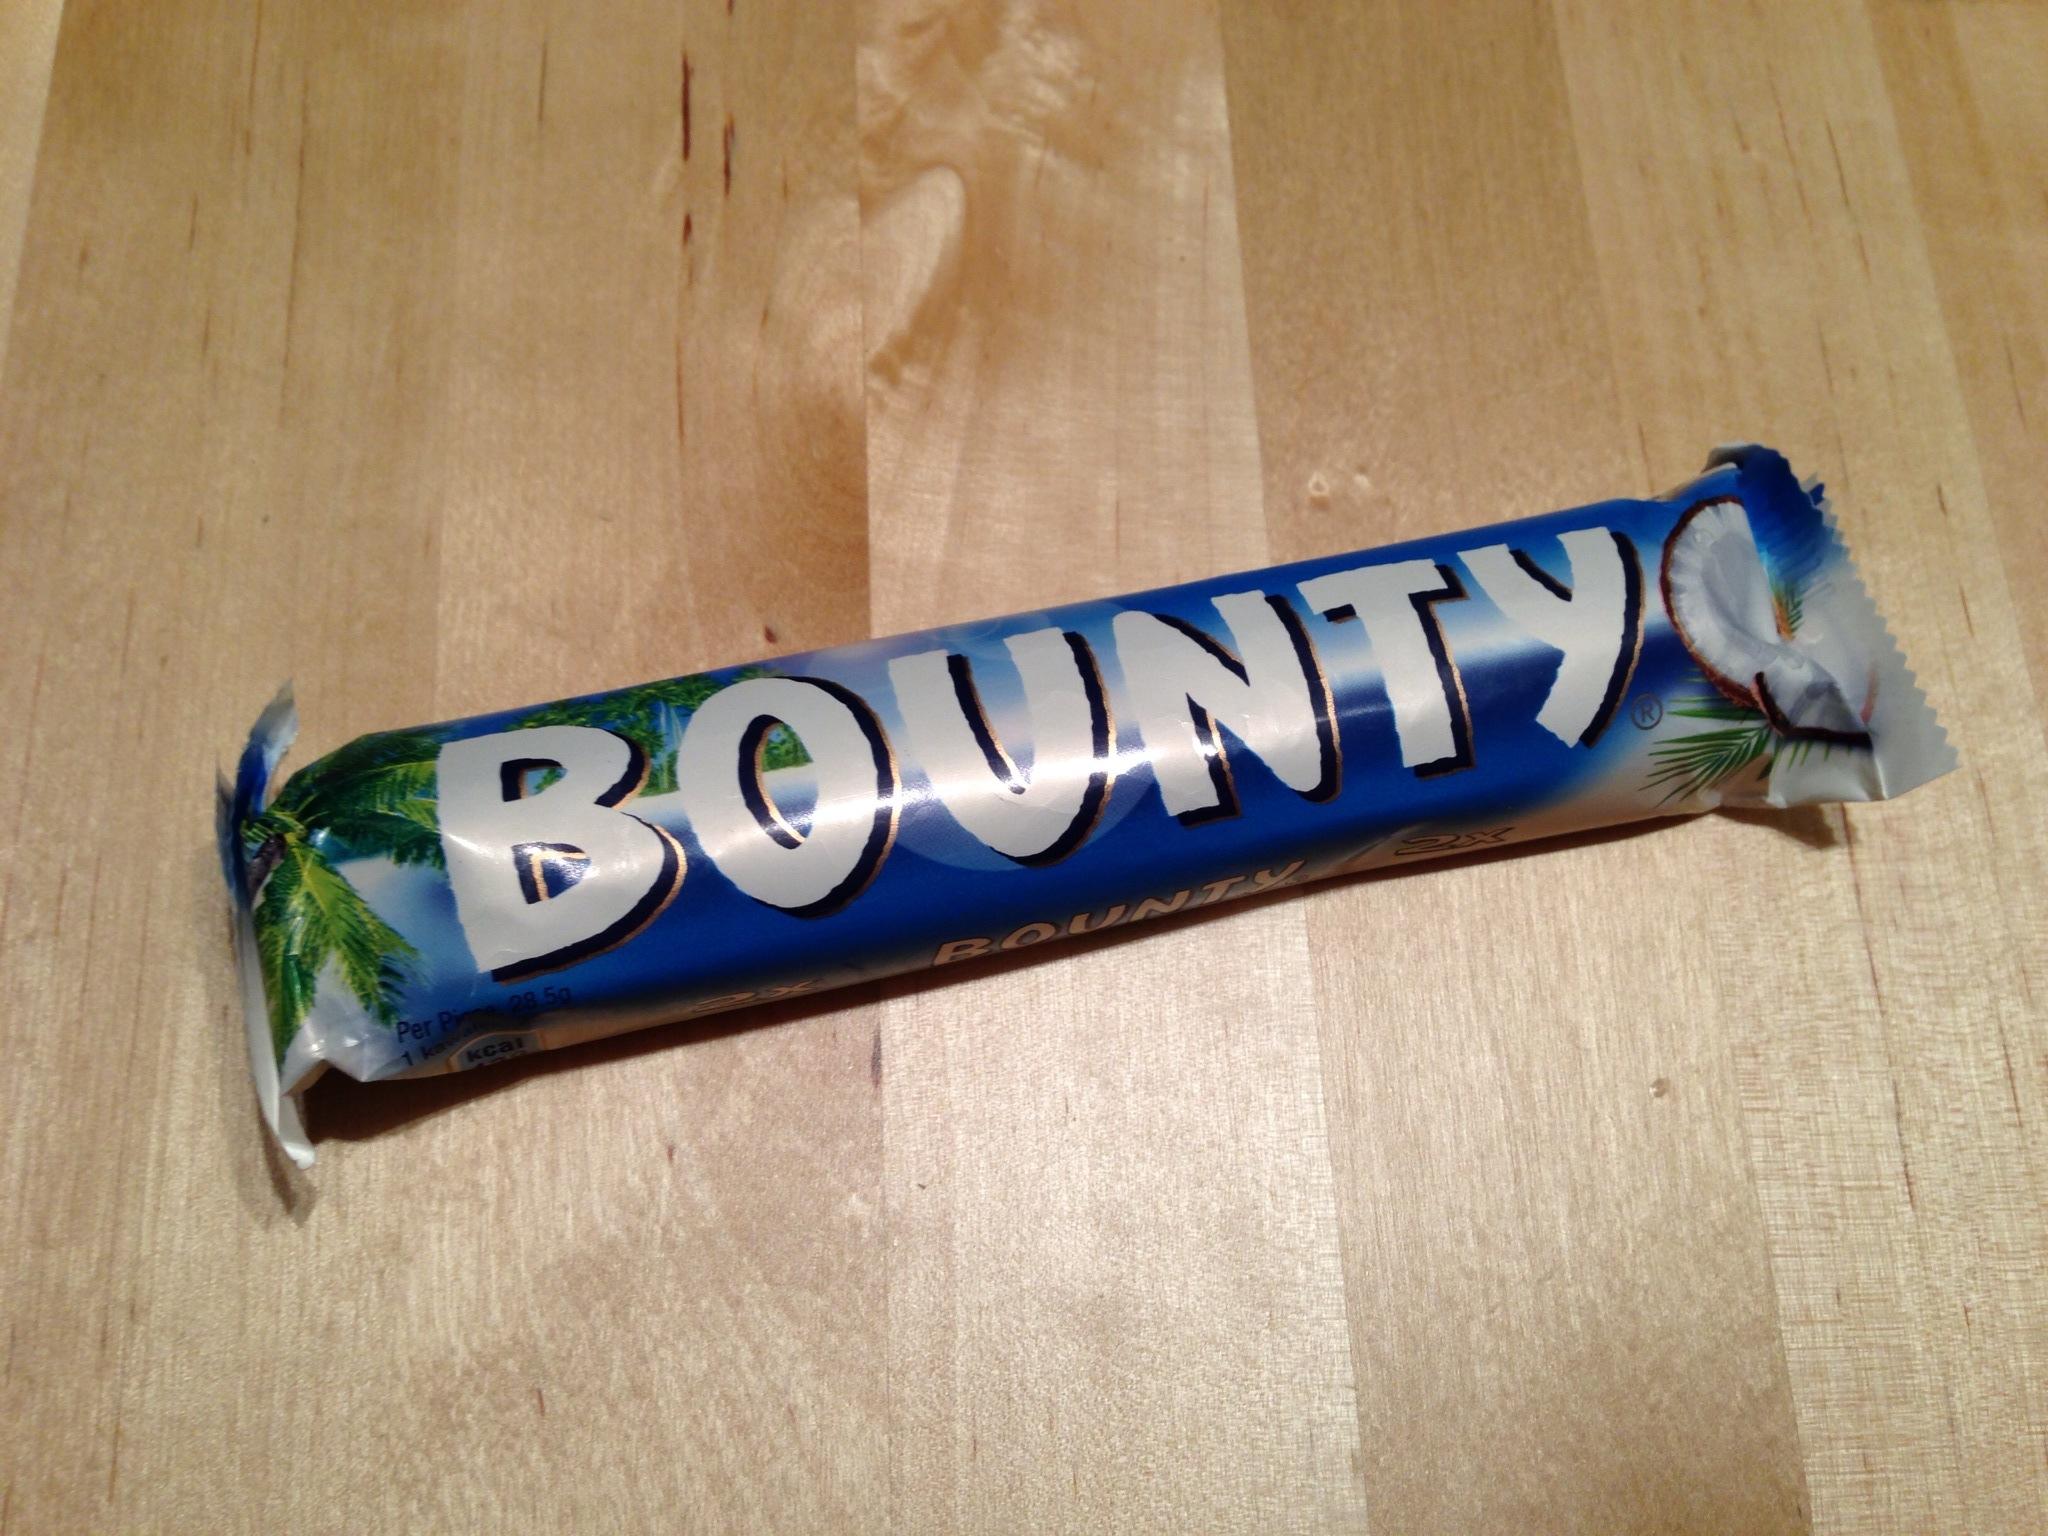 Bounty packaging.